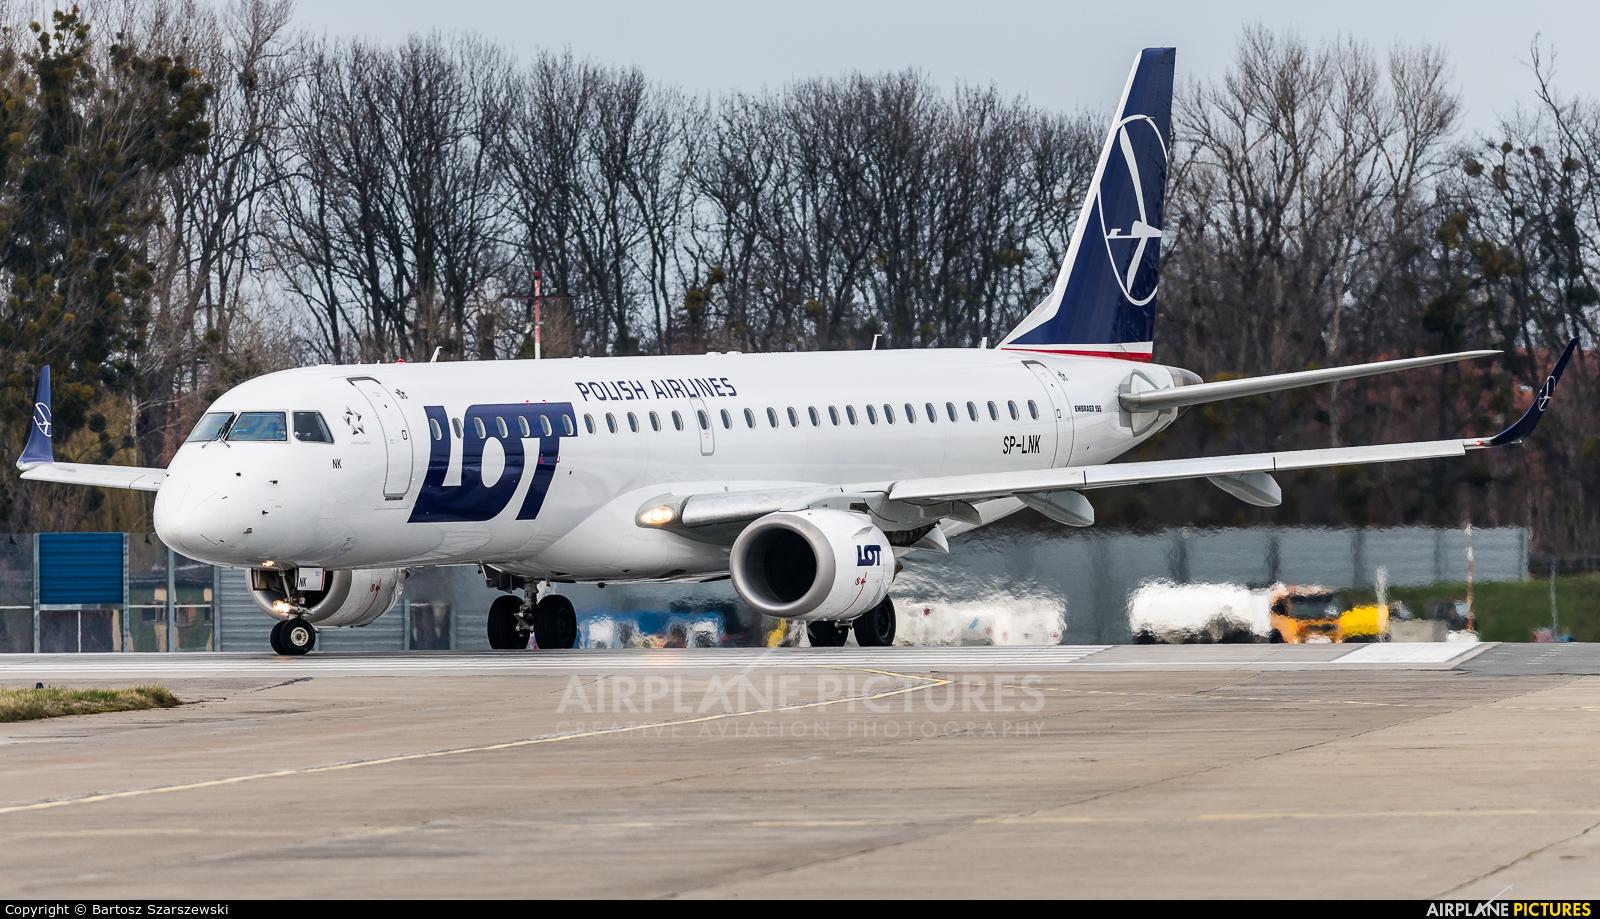 LOT - Polish Airlines SP-LNK aircraft at Wrocław - Copernicus